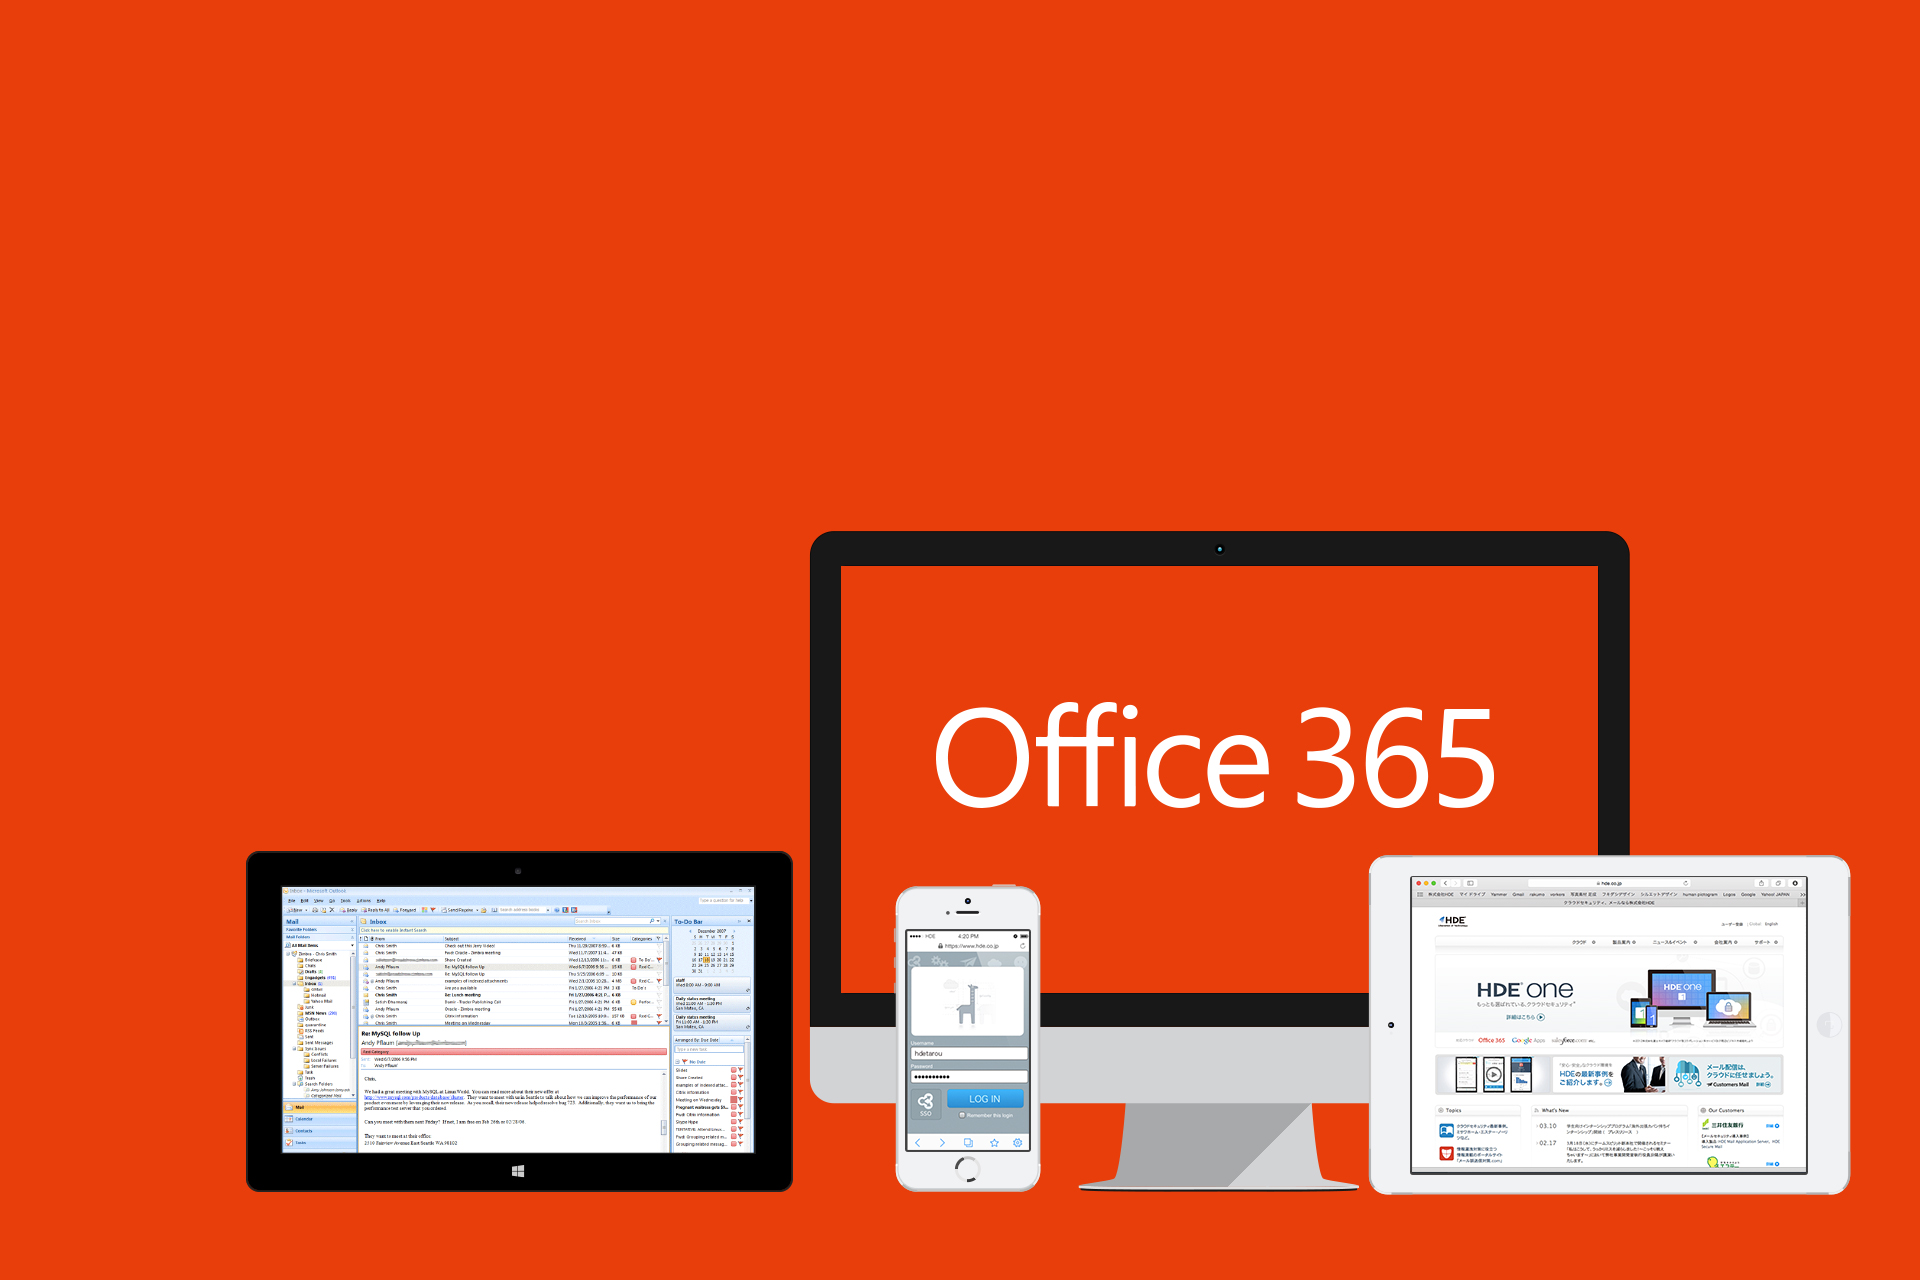 Office 365: 365 Office